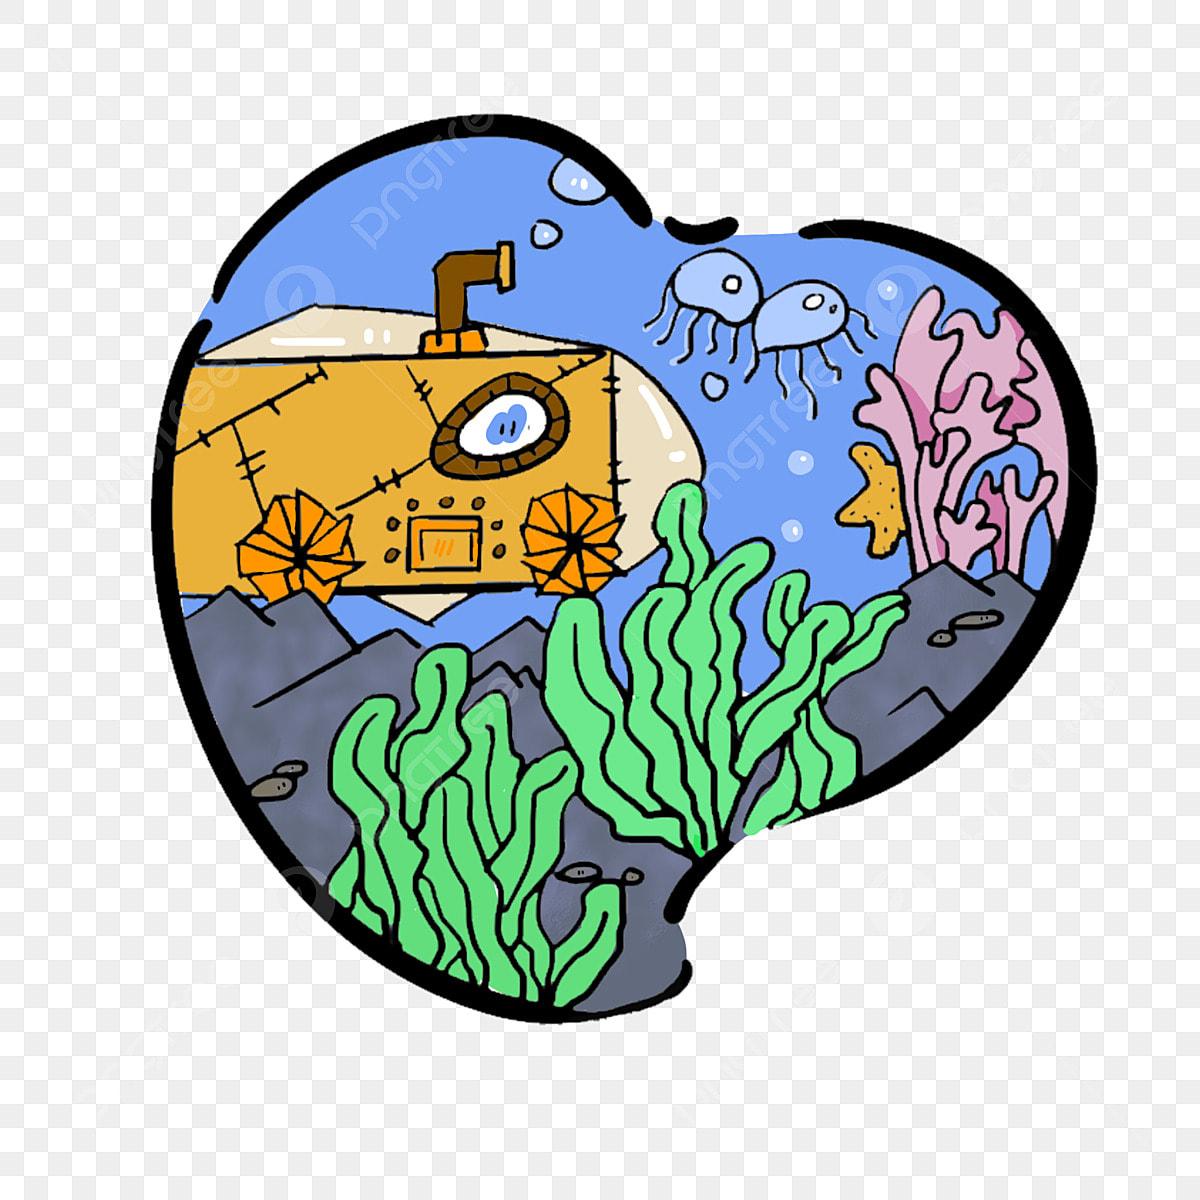 Tangan Digambar Kartun El Bawah Laut Corak Hiasan